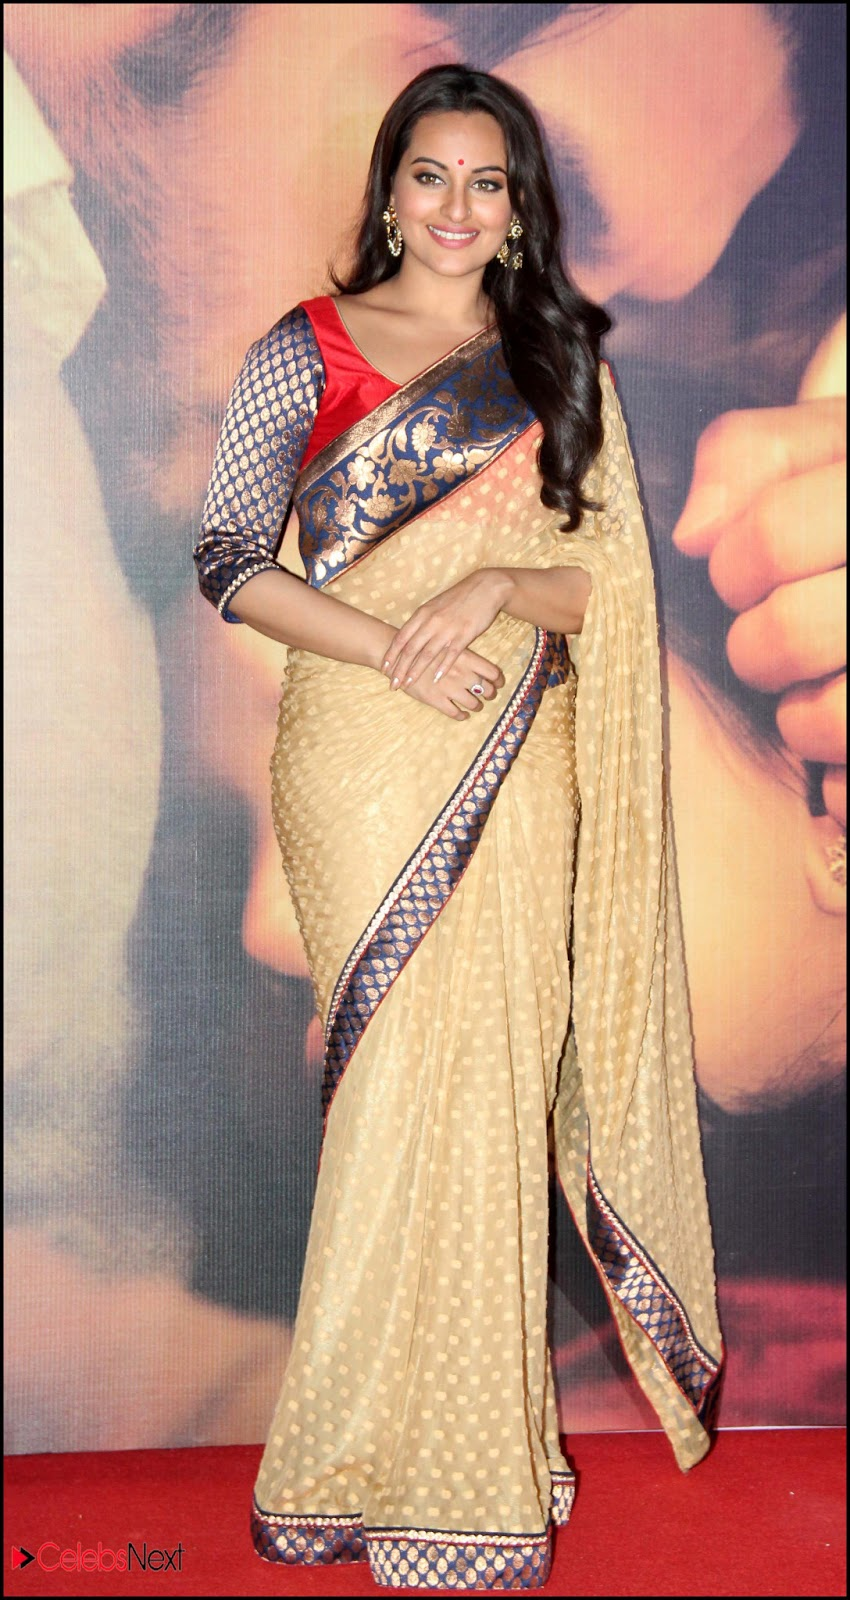 High Quality: Sonakshi Sinha Pos in Saree at Star Plus ...